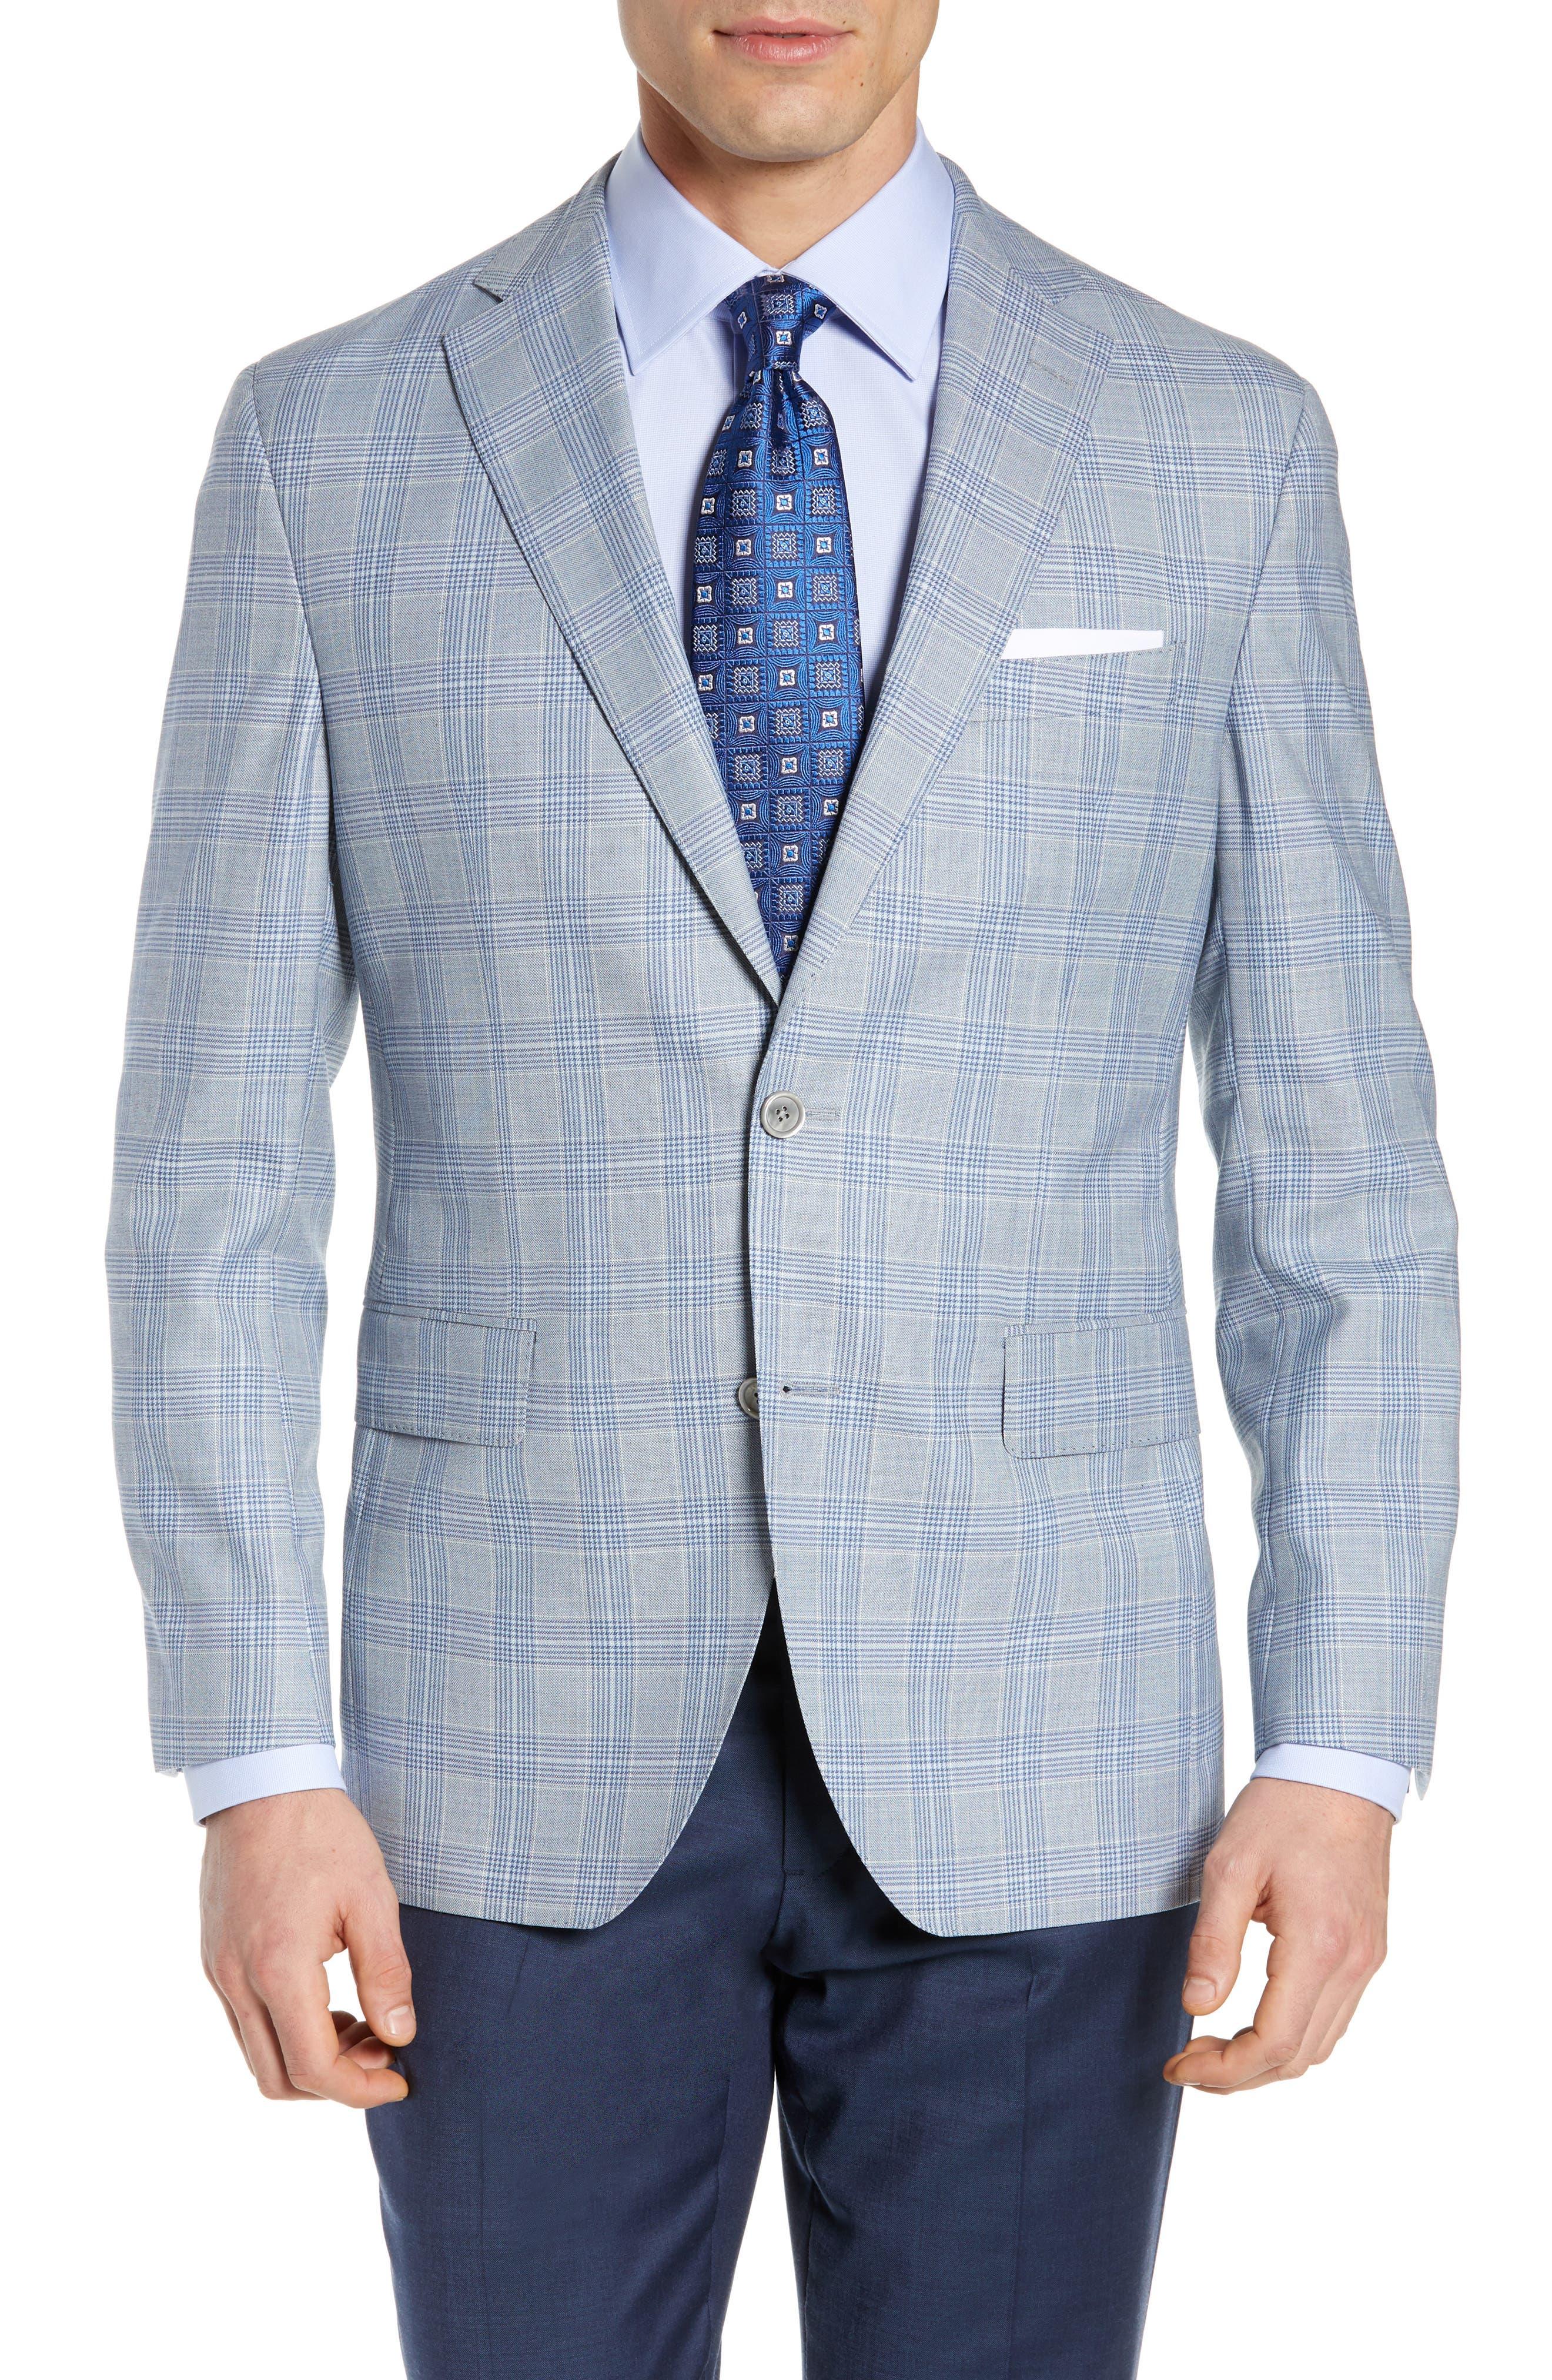 DAVID DONAHUE, Arnold Classic Fit Plaid Wool Sport Coat, Main thumbnail 1, color, BLUE